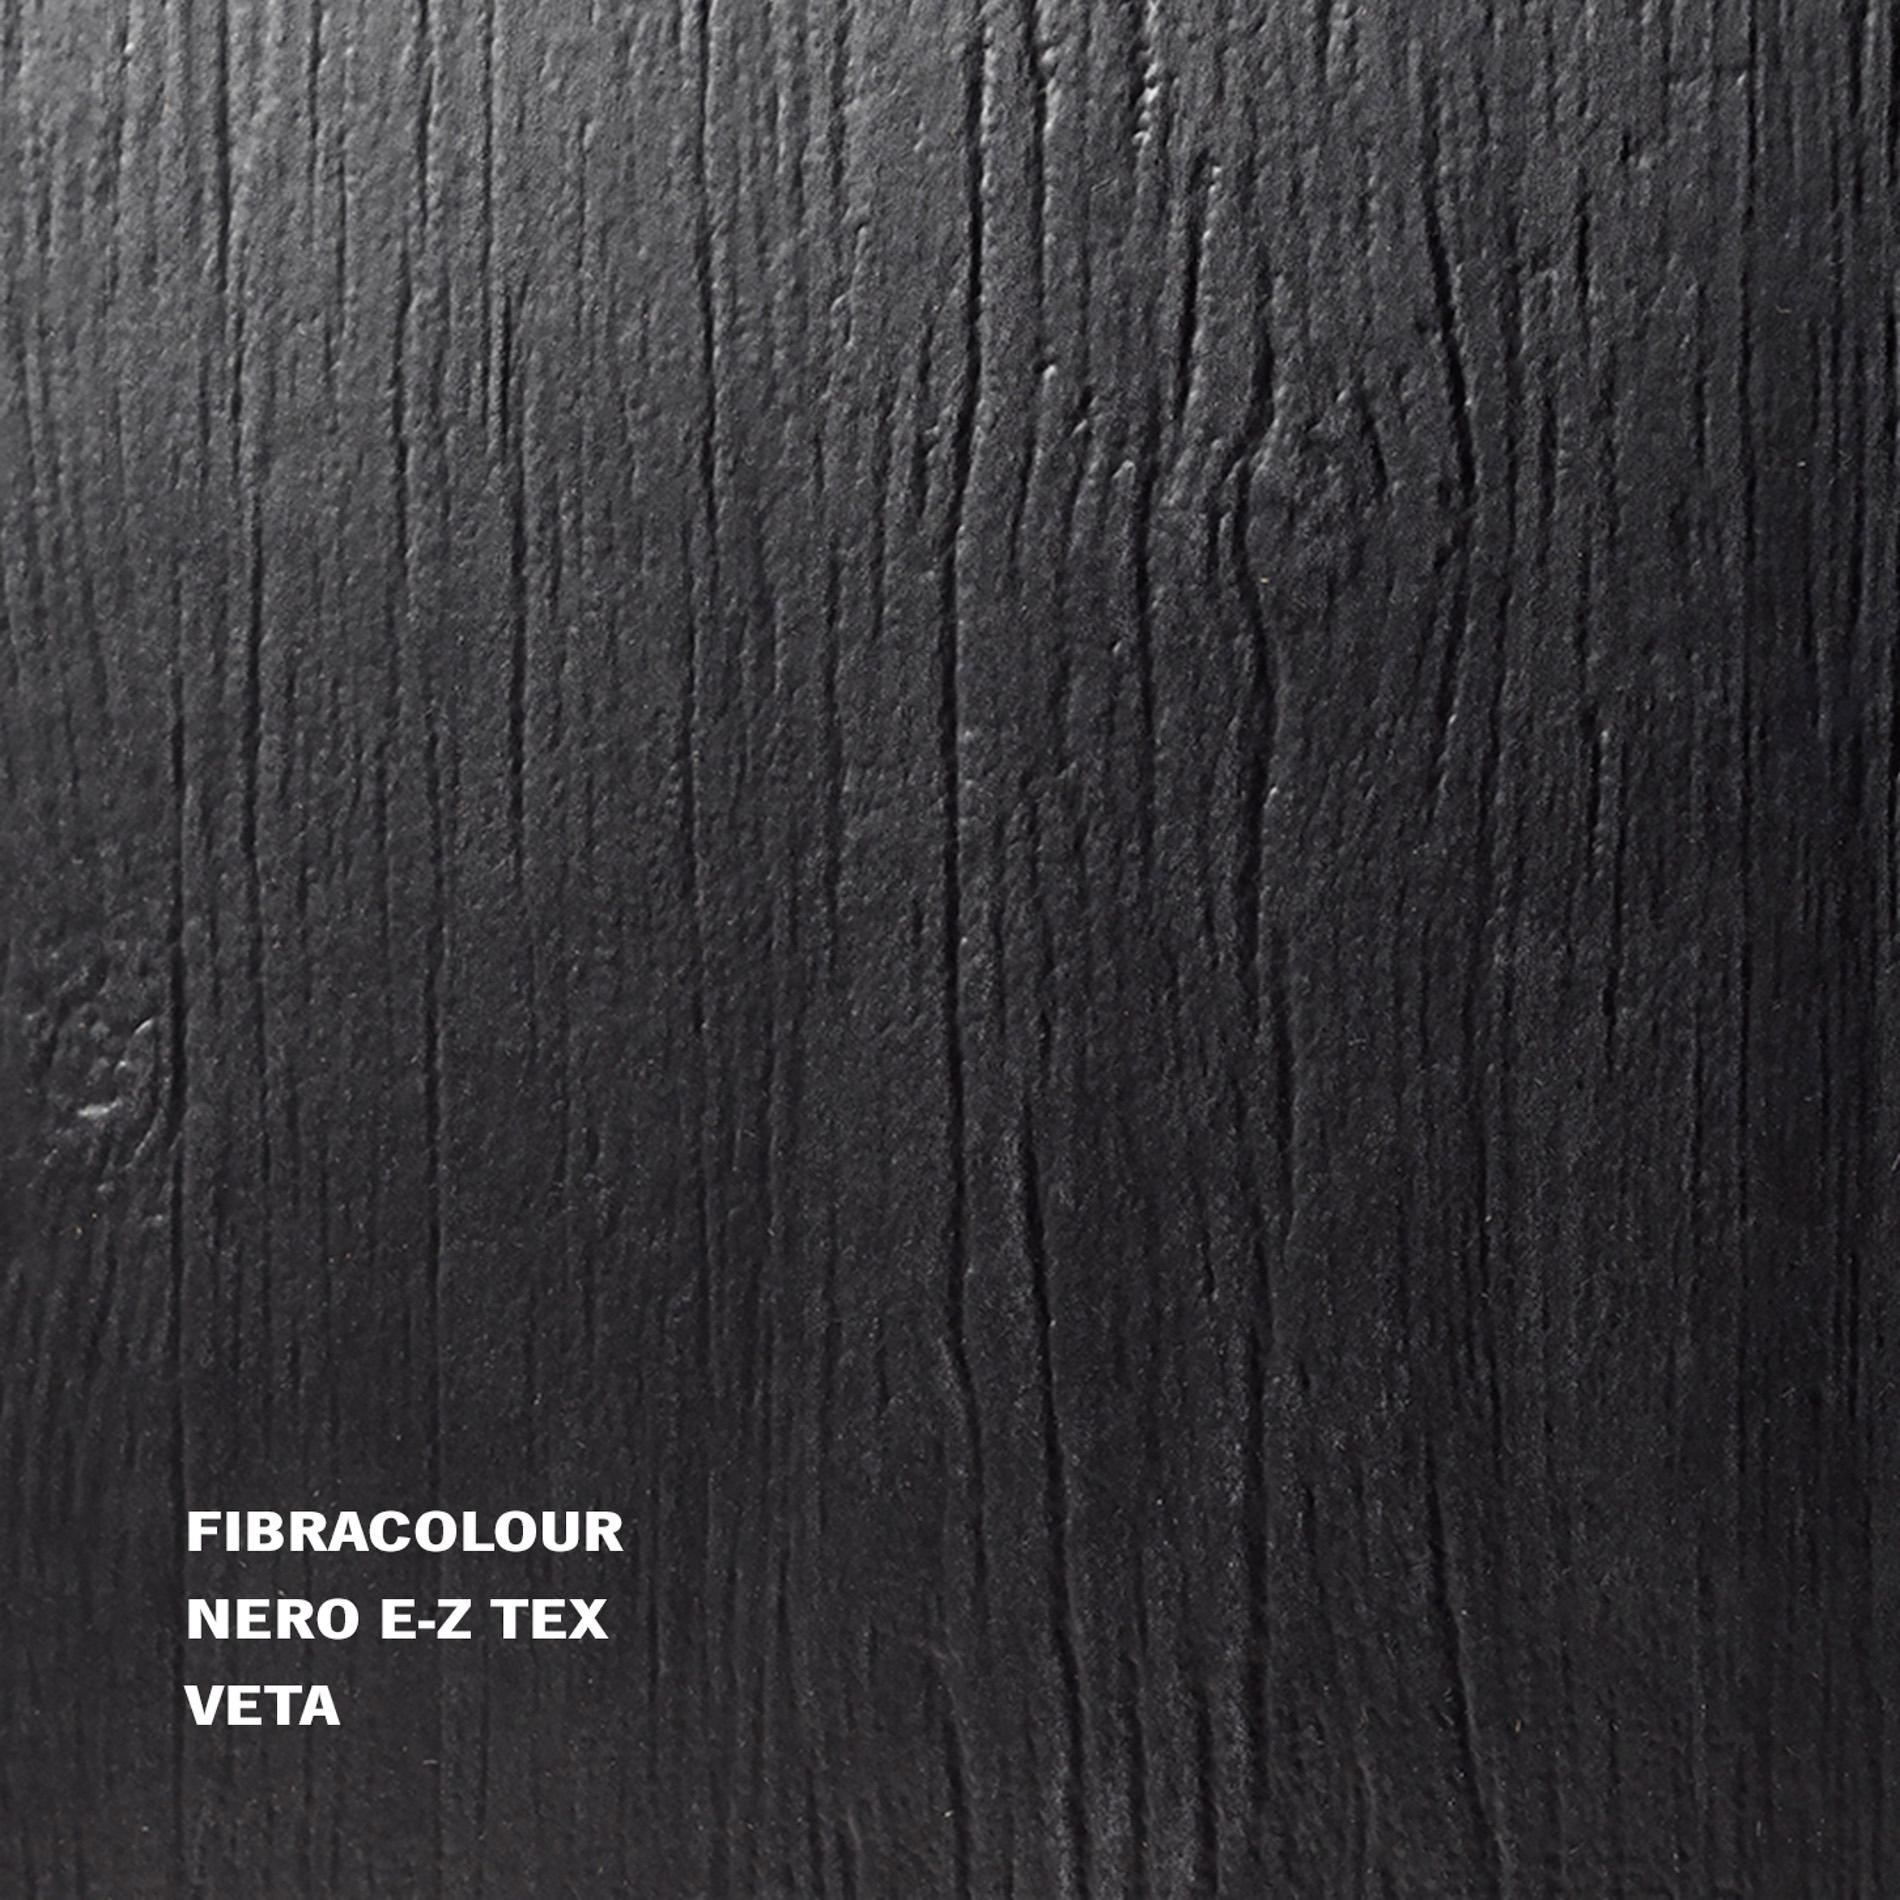 Fibracolor_VETA_2